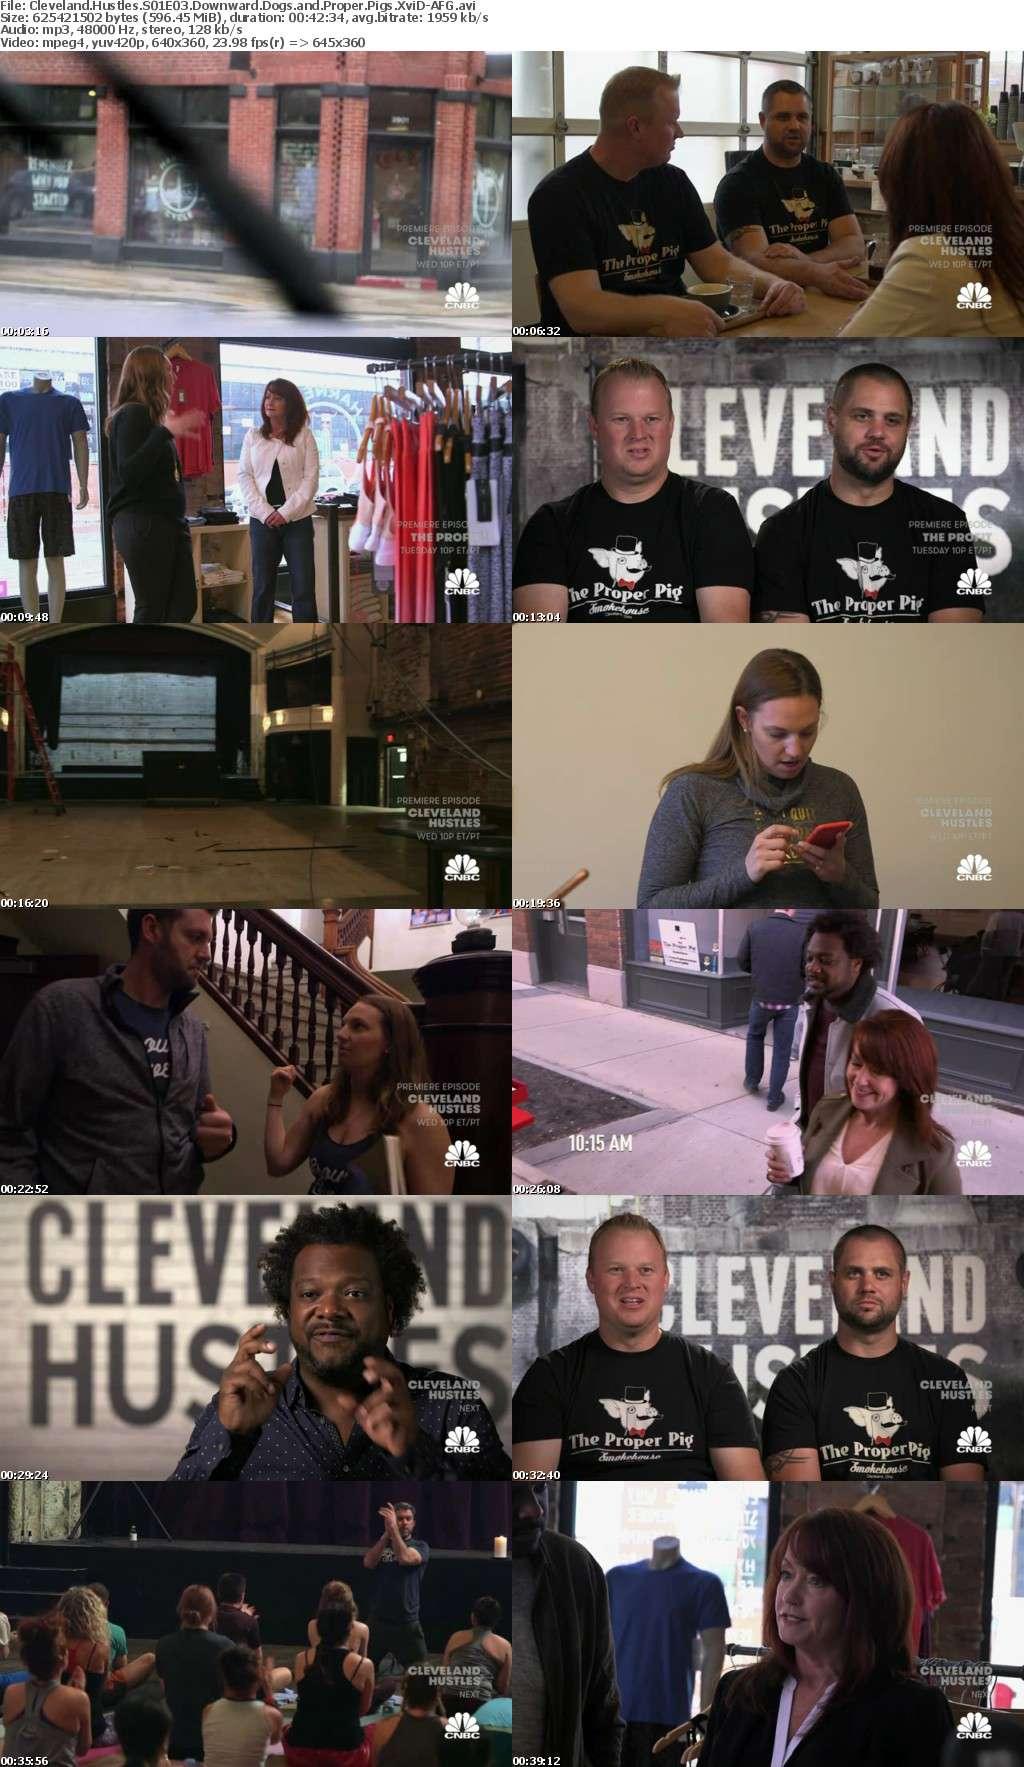 Cleveland Hustles S01E03 Downward Dogs and Proper Pigs XviD-AFG